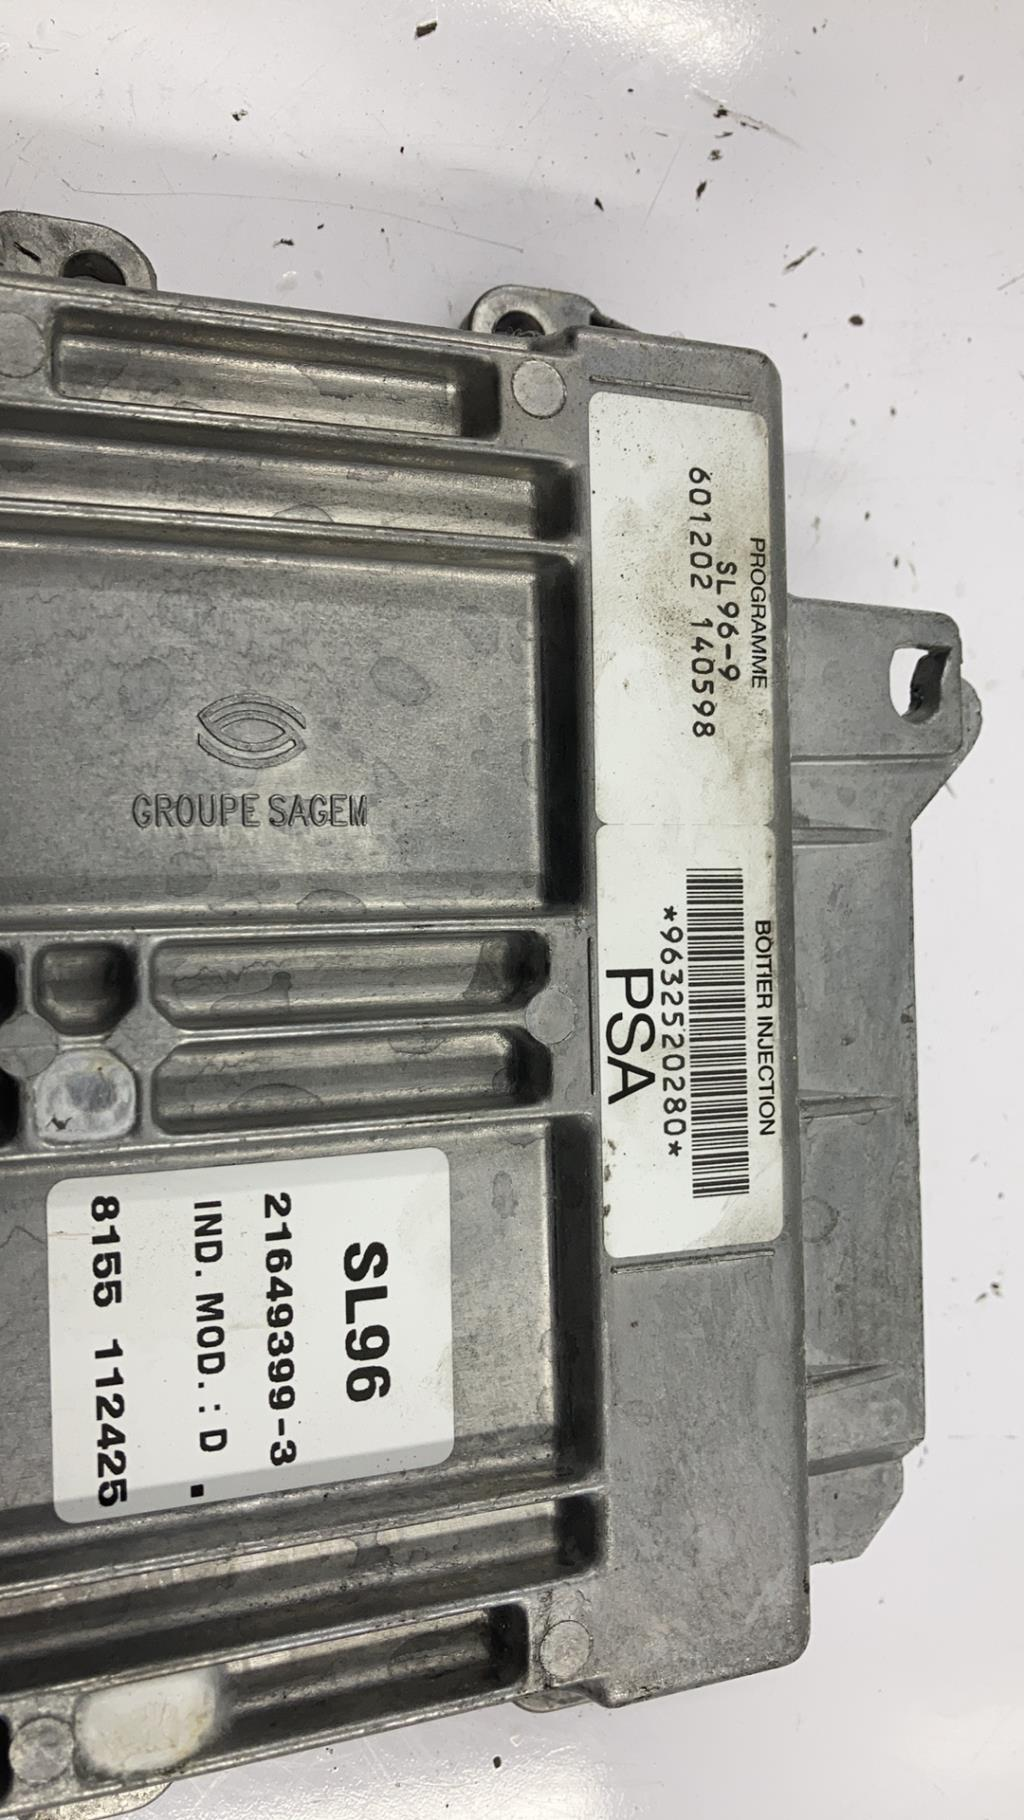 Calculateur PEUGEOT 306 PHASE 2 Essence